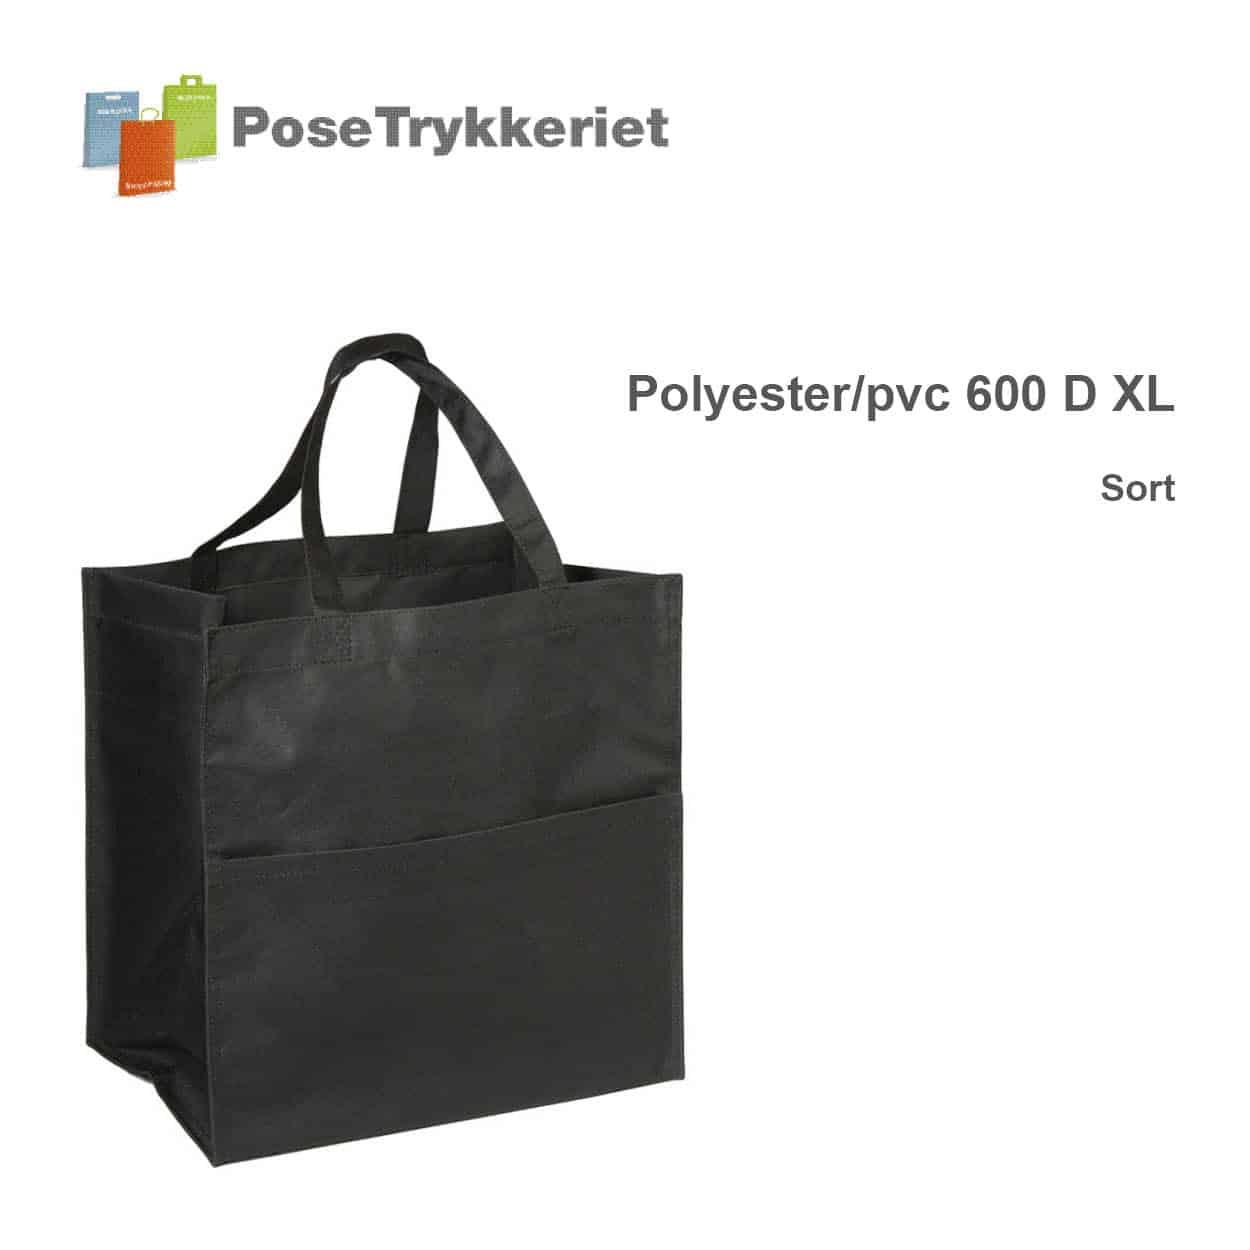 Revisor poser polyester 600 D XL. Sort. PoseTrykkeriet.dk